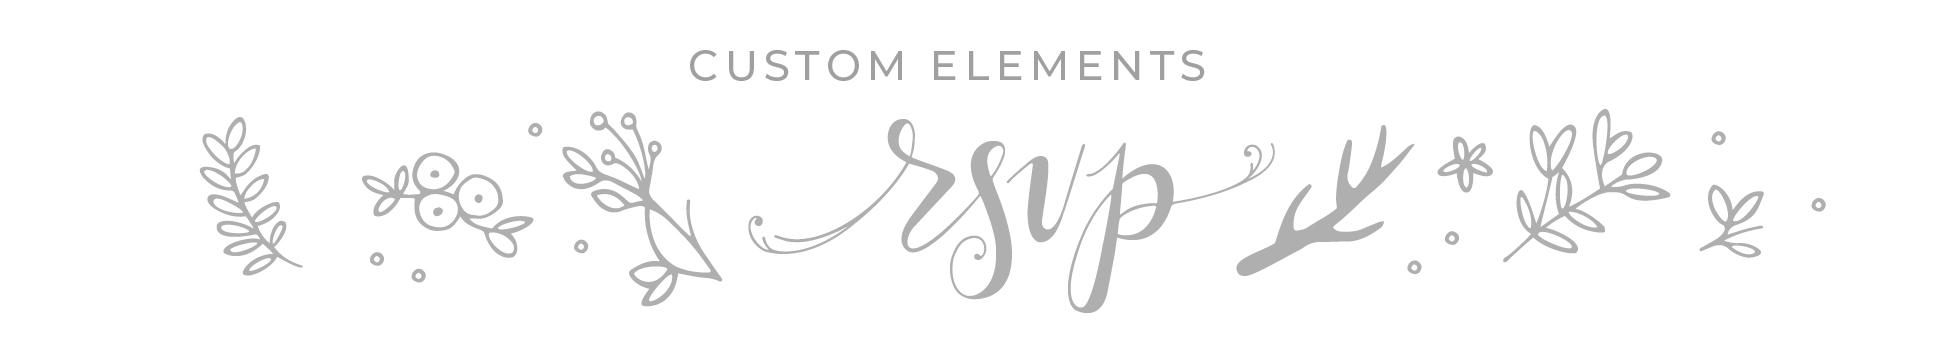 Jana_Site_Elements-03.jpg